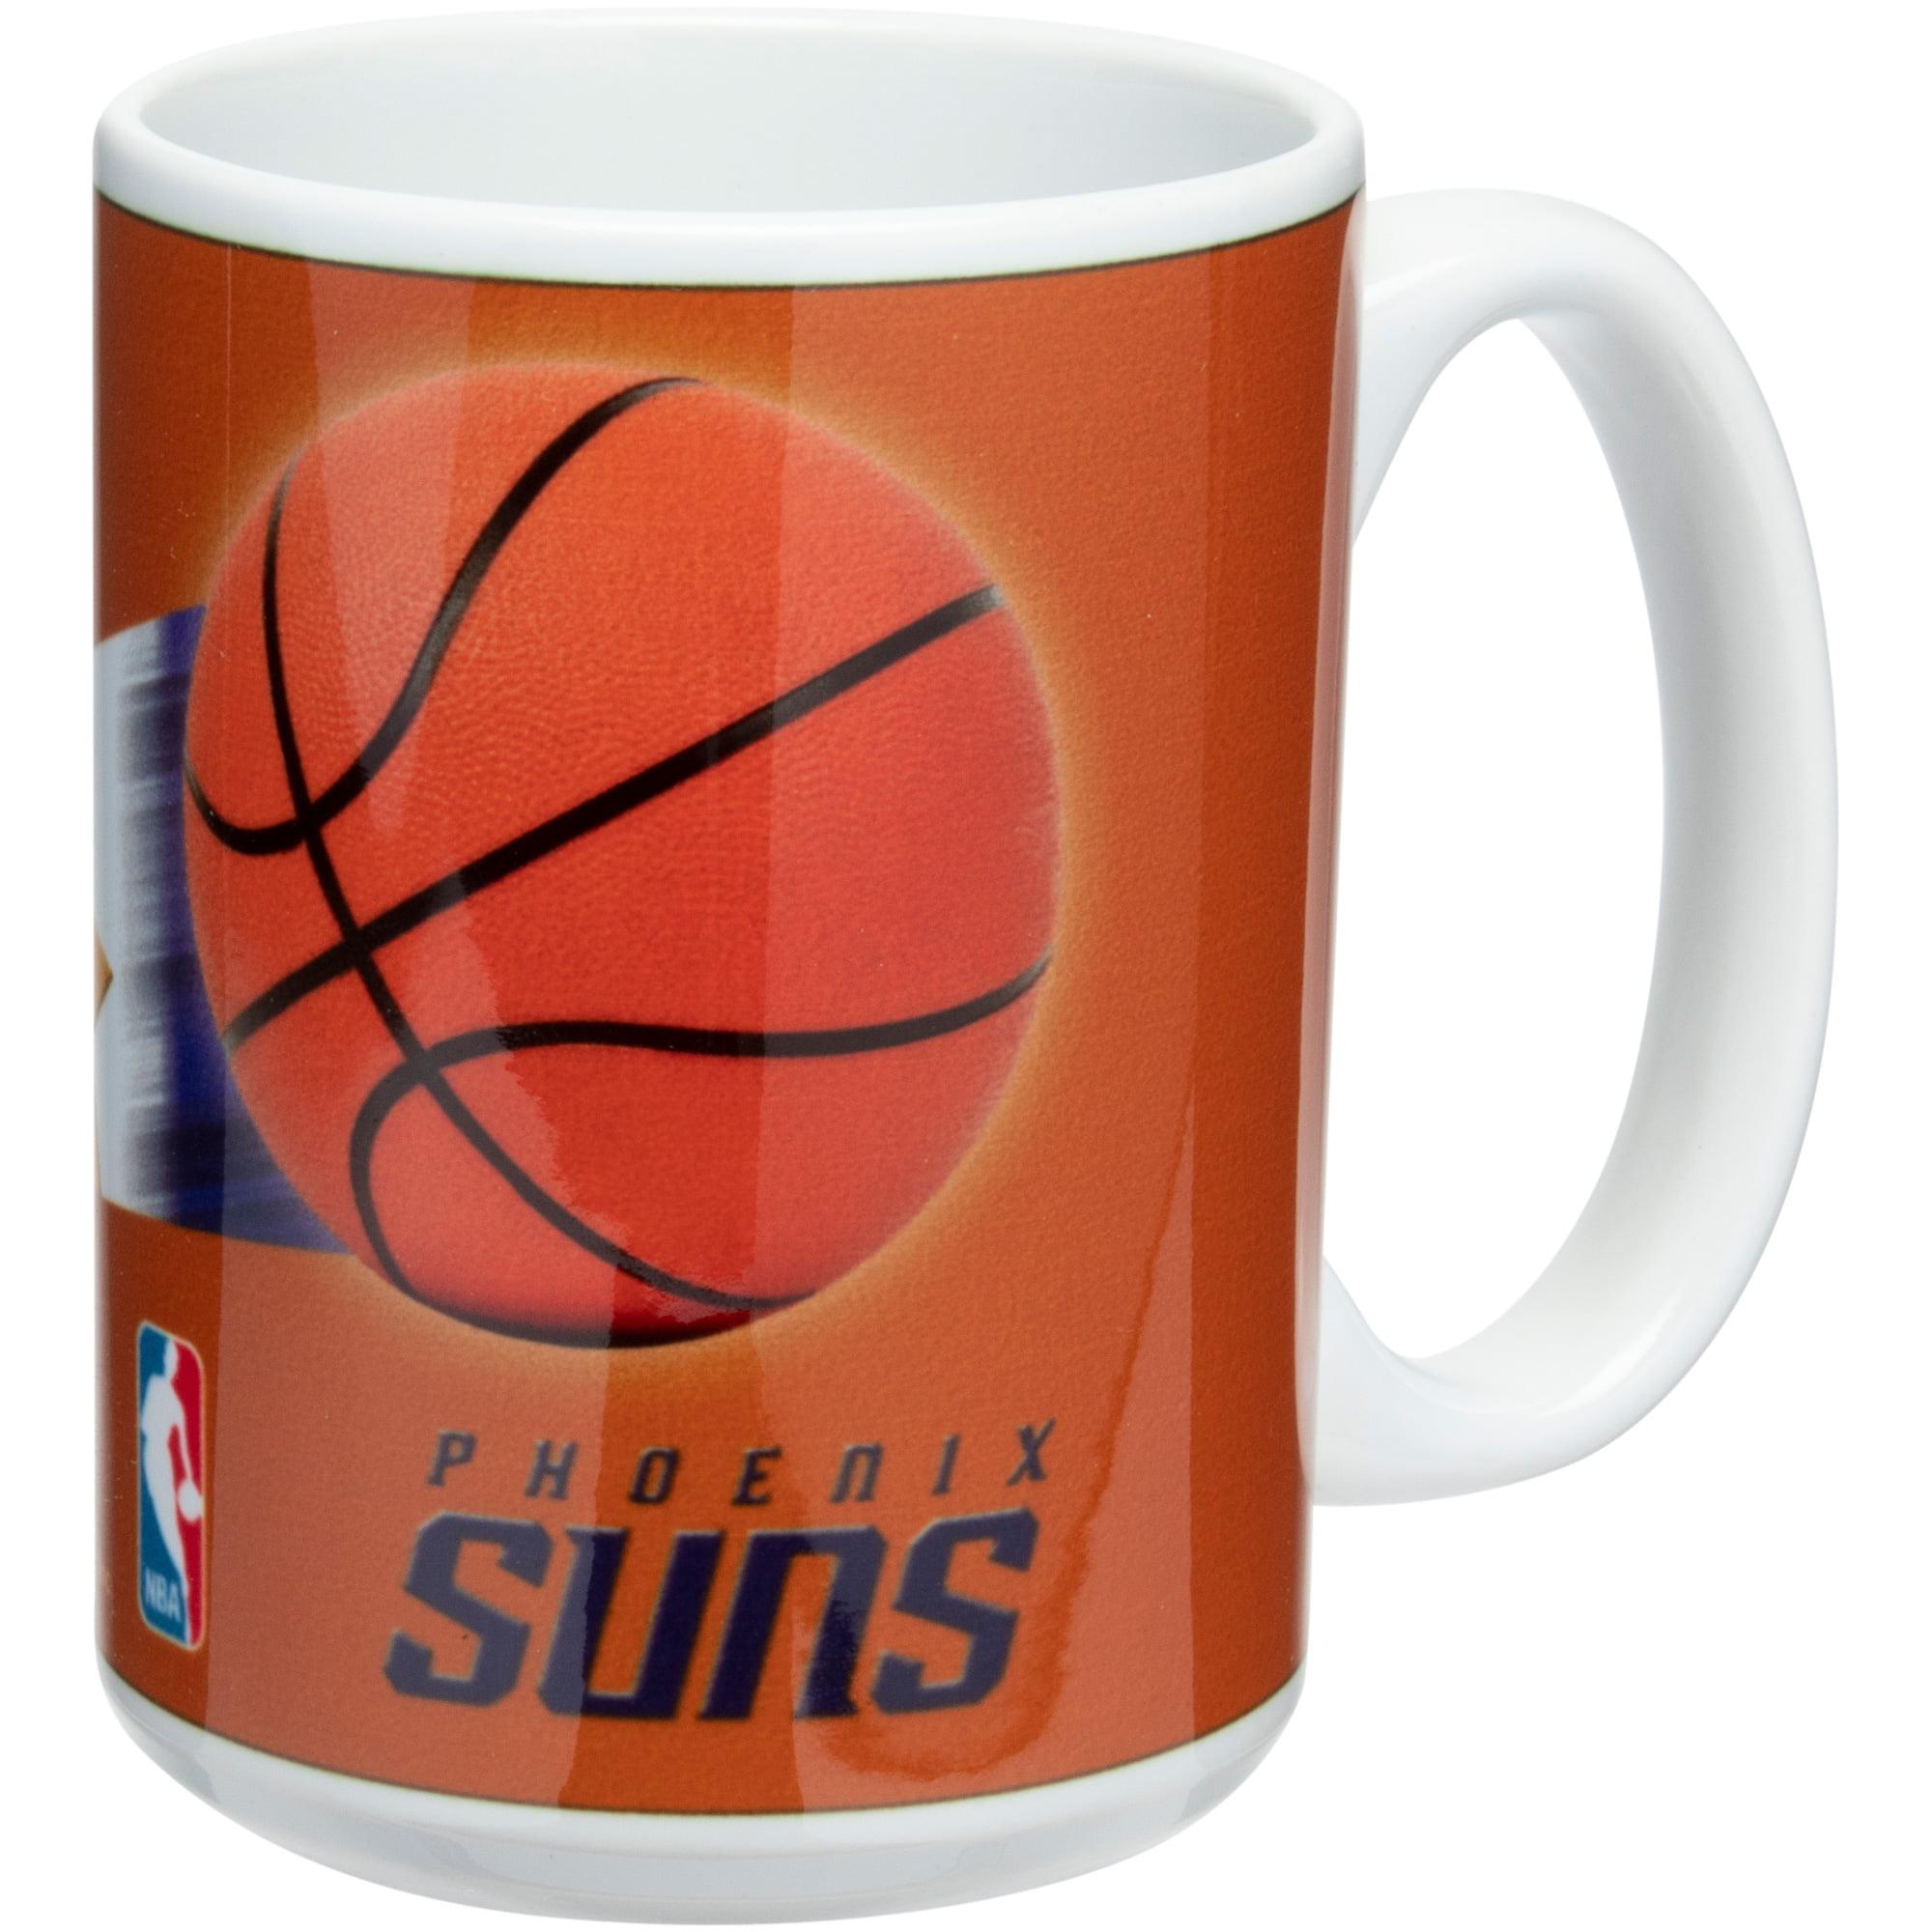 Phoenix Suns 15oz. Team 3D Graphic Mug - No Size